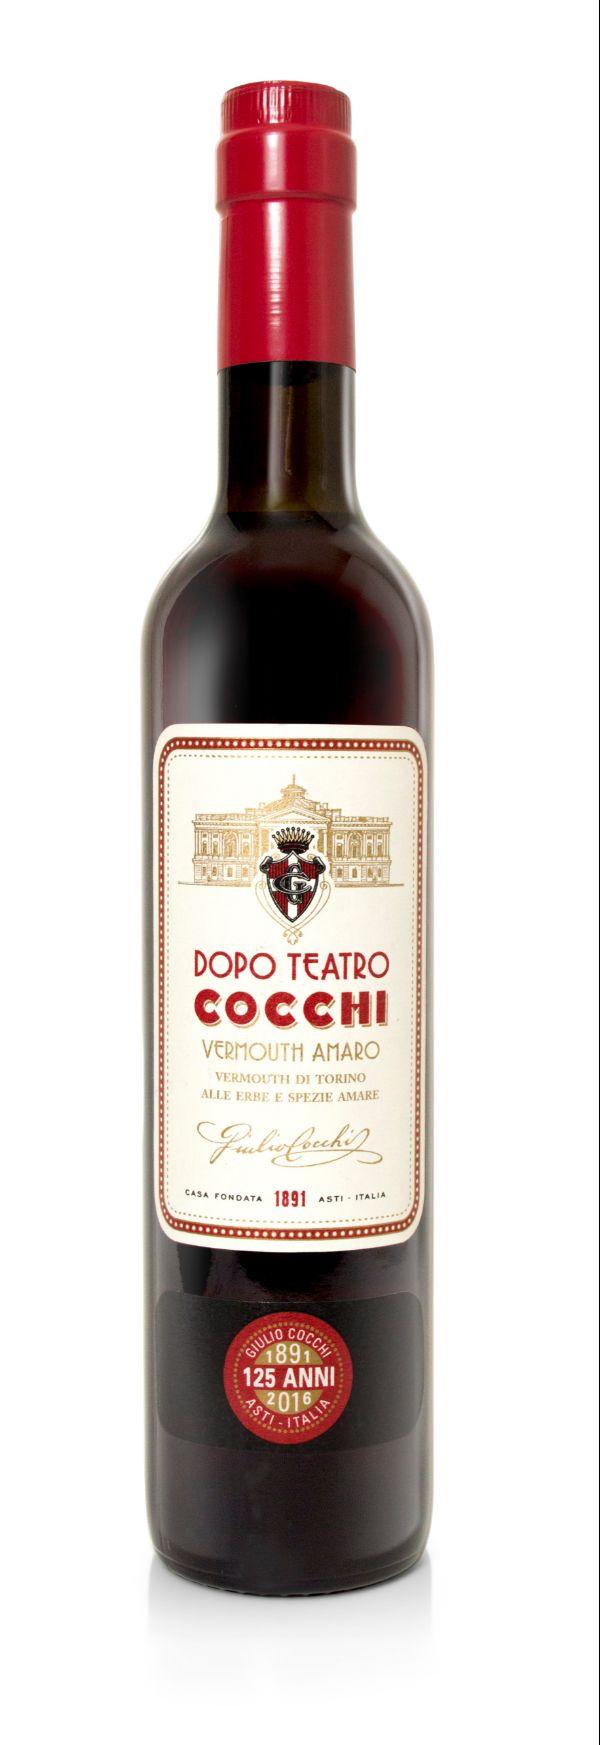 Cocchi Dopo Teatro Vermouth Amaro